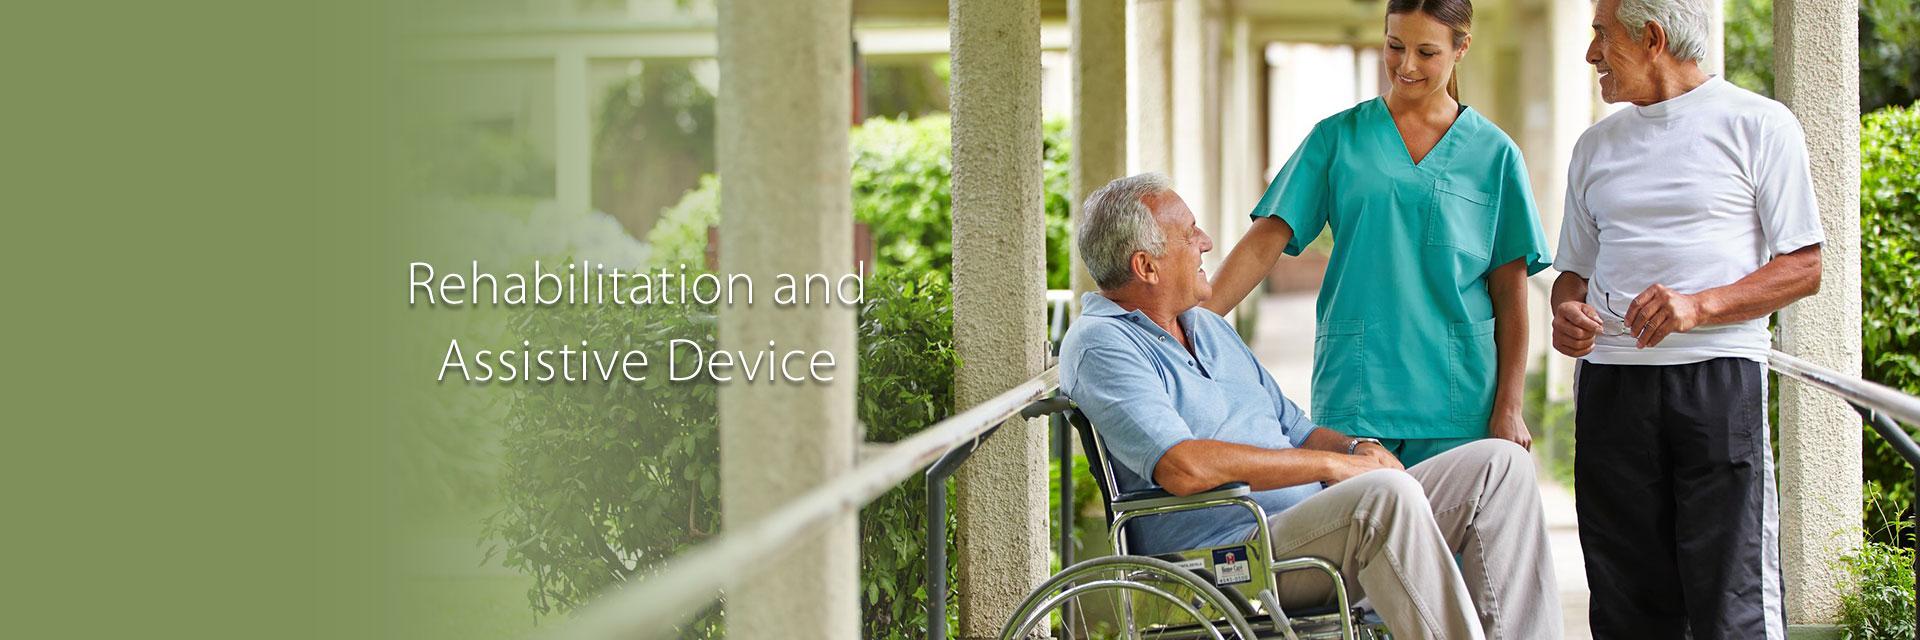 Rehabilitation and Assistive Device